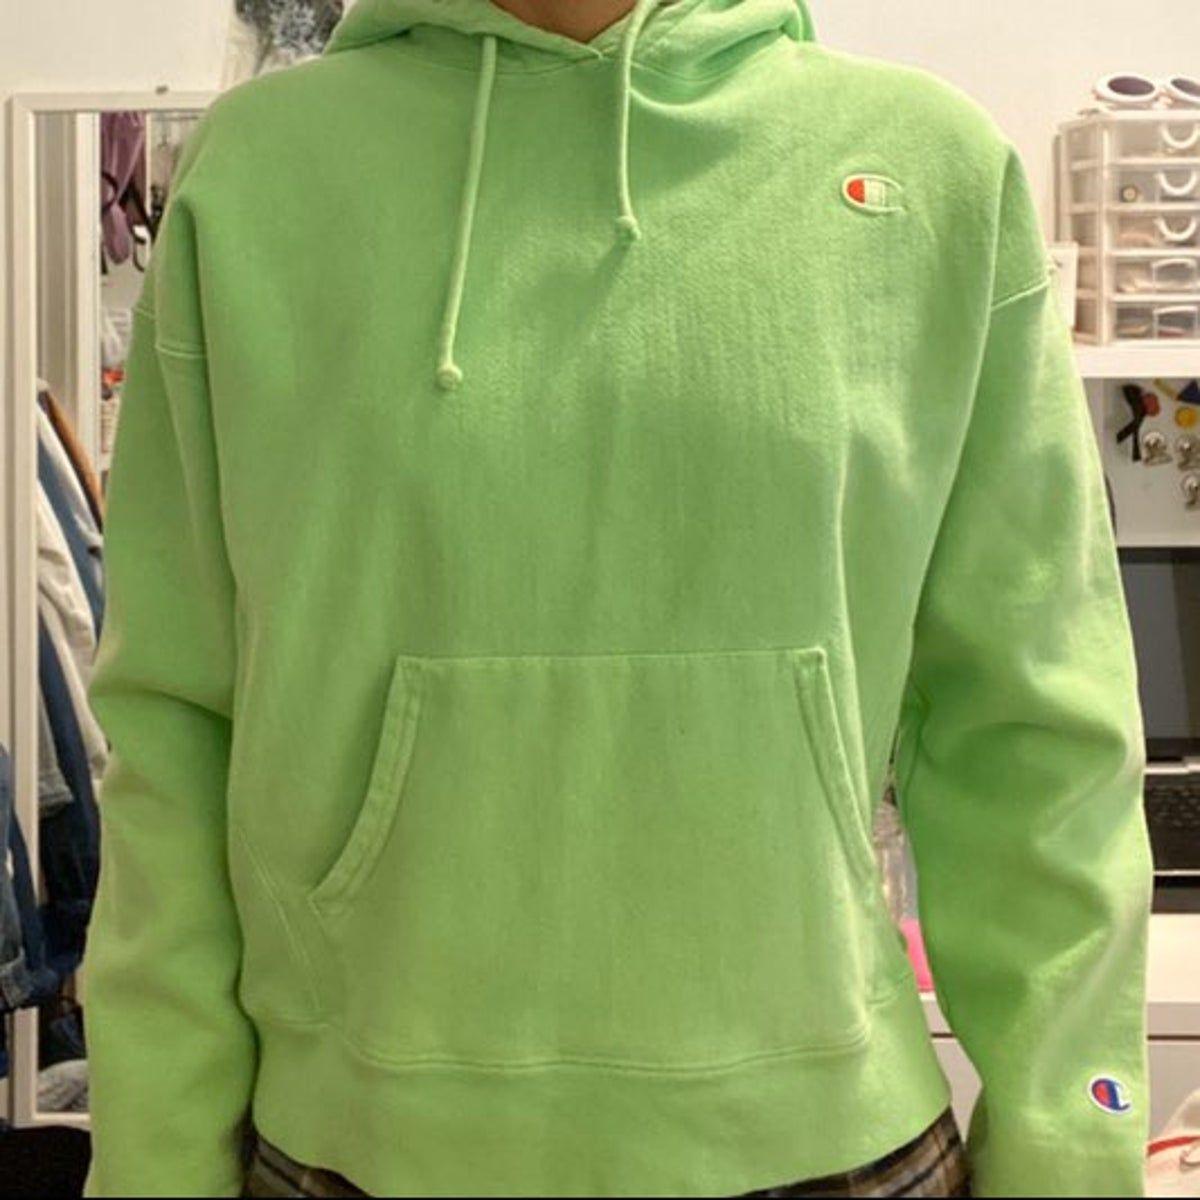 Neon Green Champion Hoodie In 2021 Green Champion Hoodie Champion Hoodie Champion Sweatshirt [ 1200 x 1200 Pixel ]